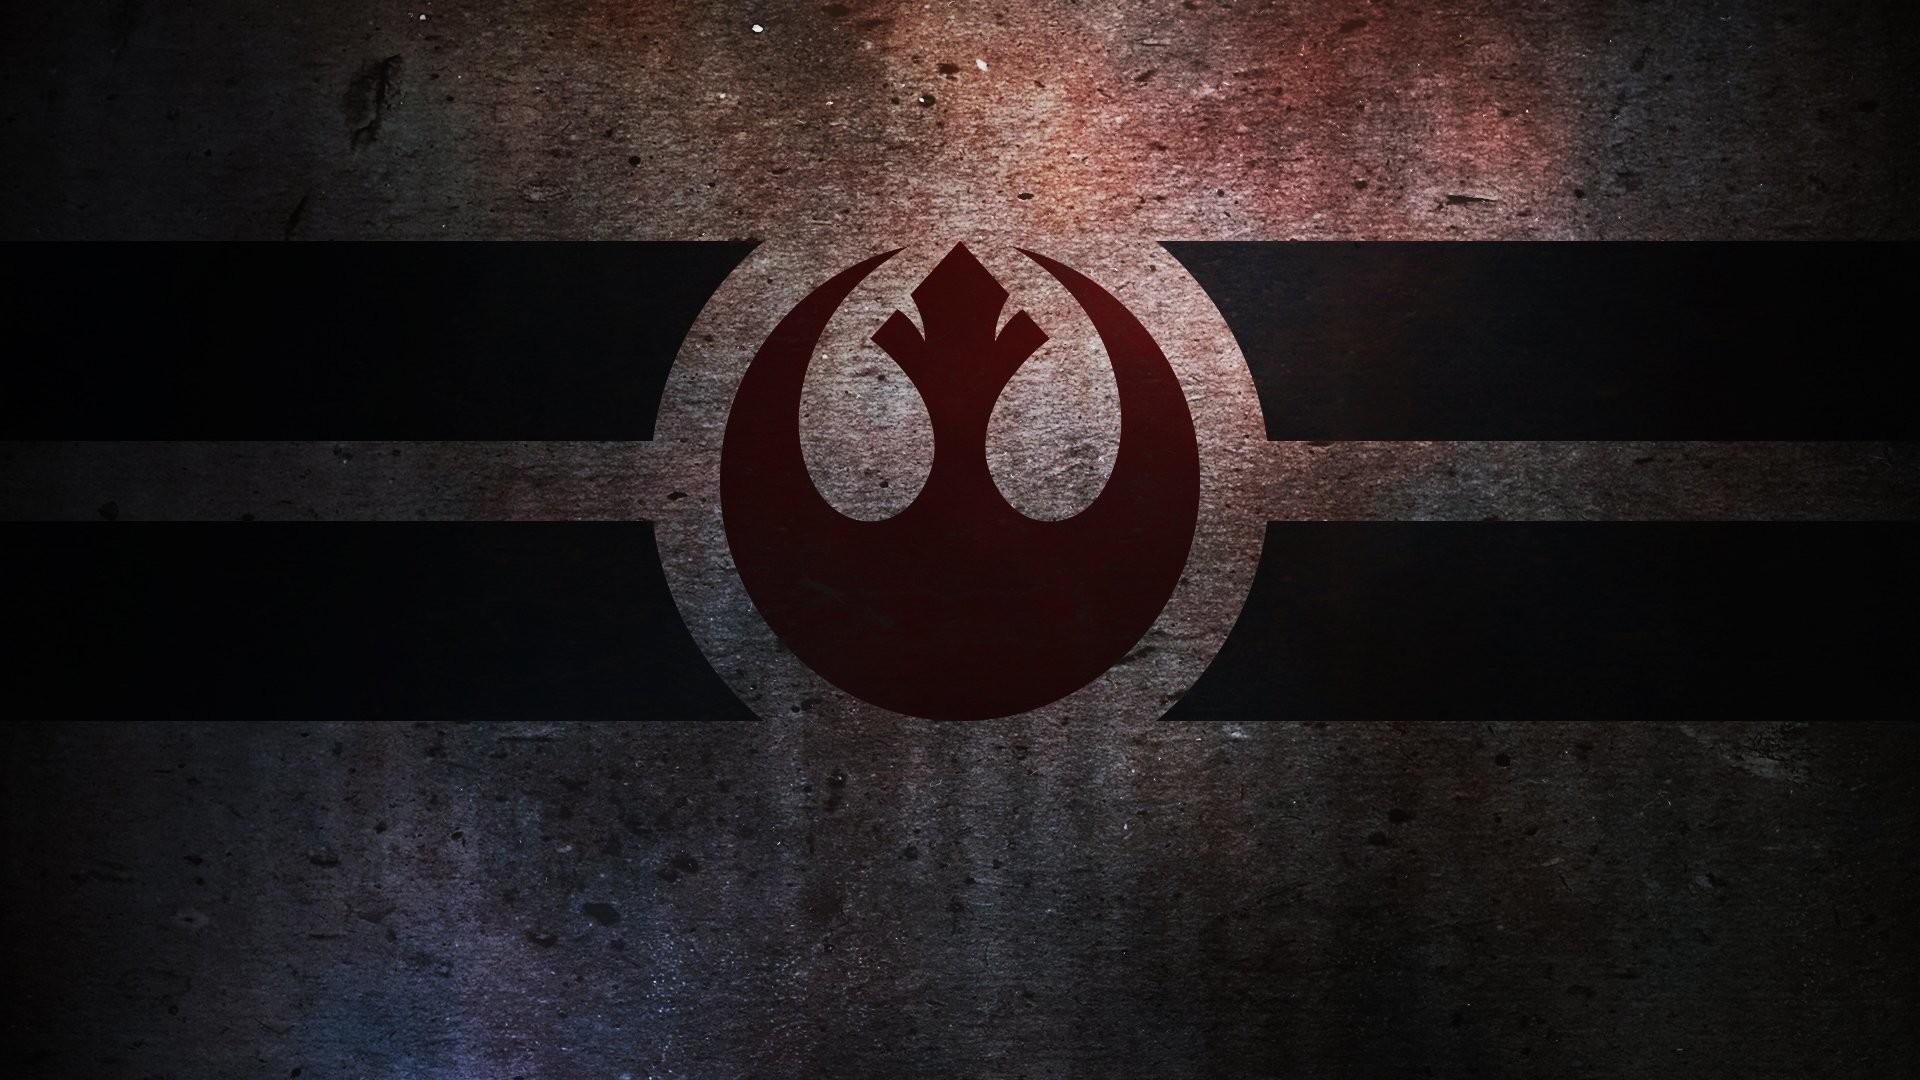 1920x1080 Movie Star Wars Wallpaper Rebel 3002203 Hd Wallpaper Backgrounds Download